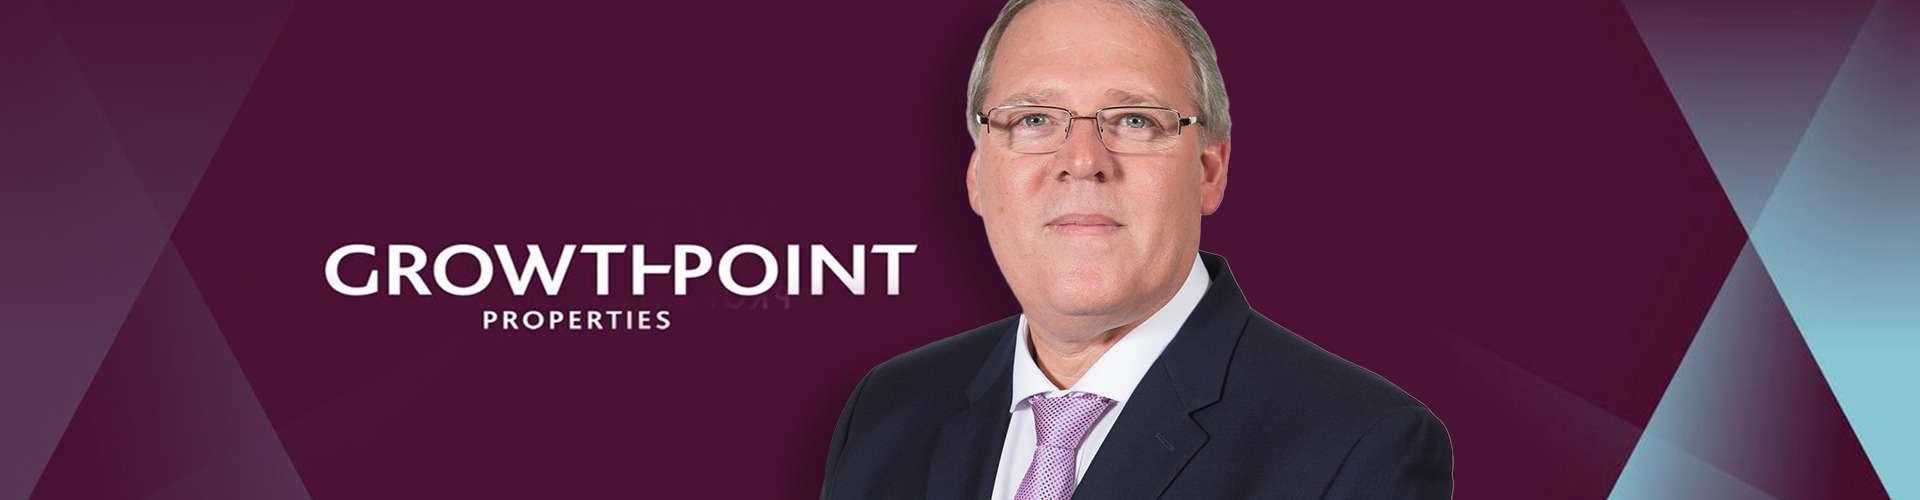 SAREIT Article Growthpoint - Rudolf Pienaar